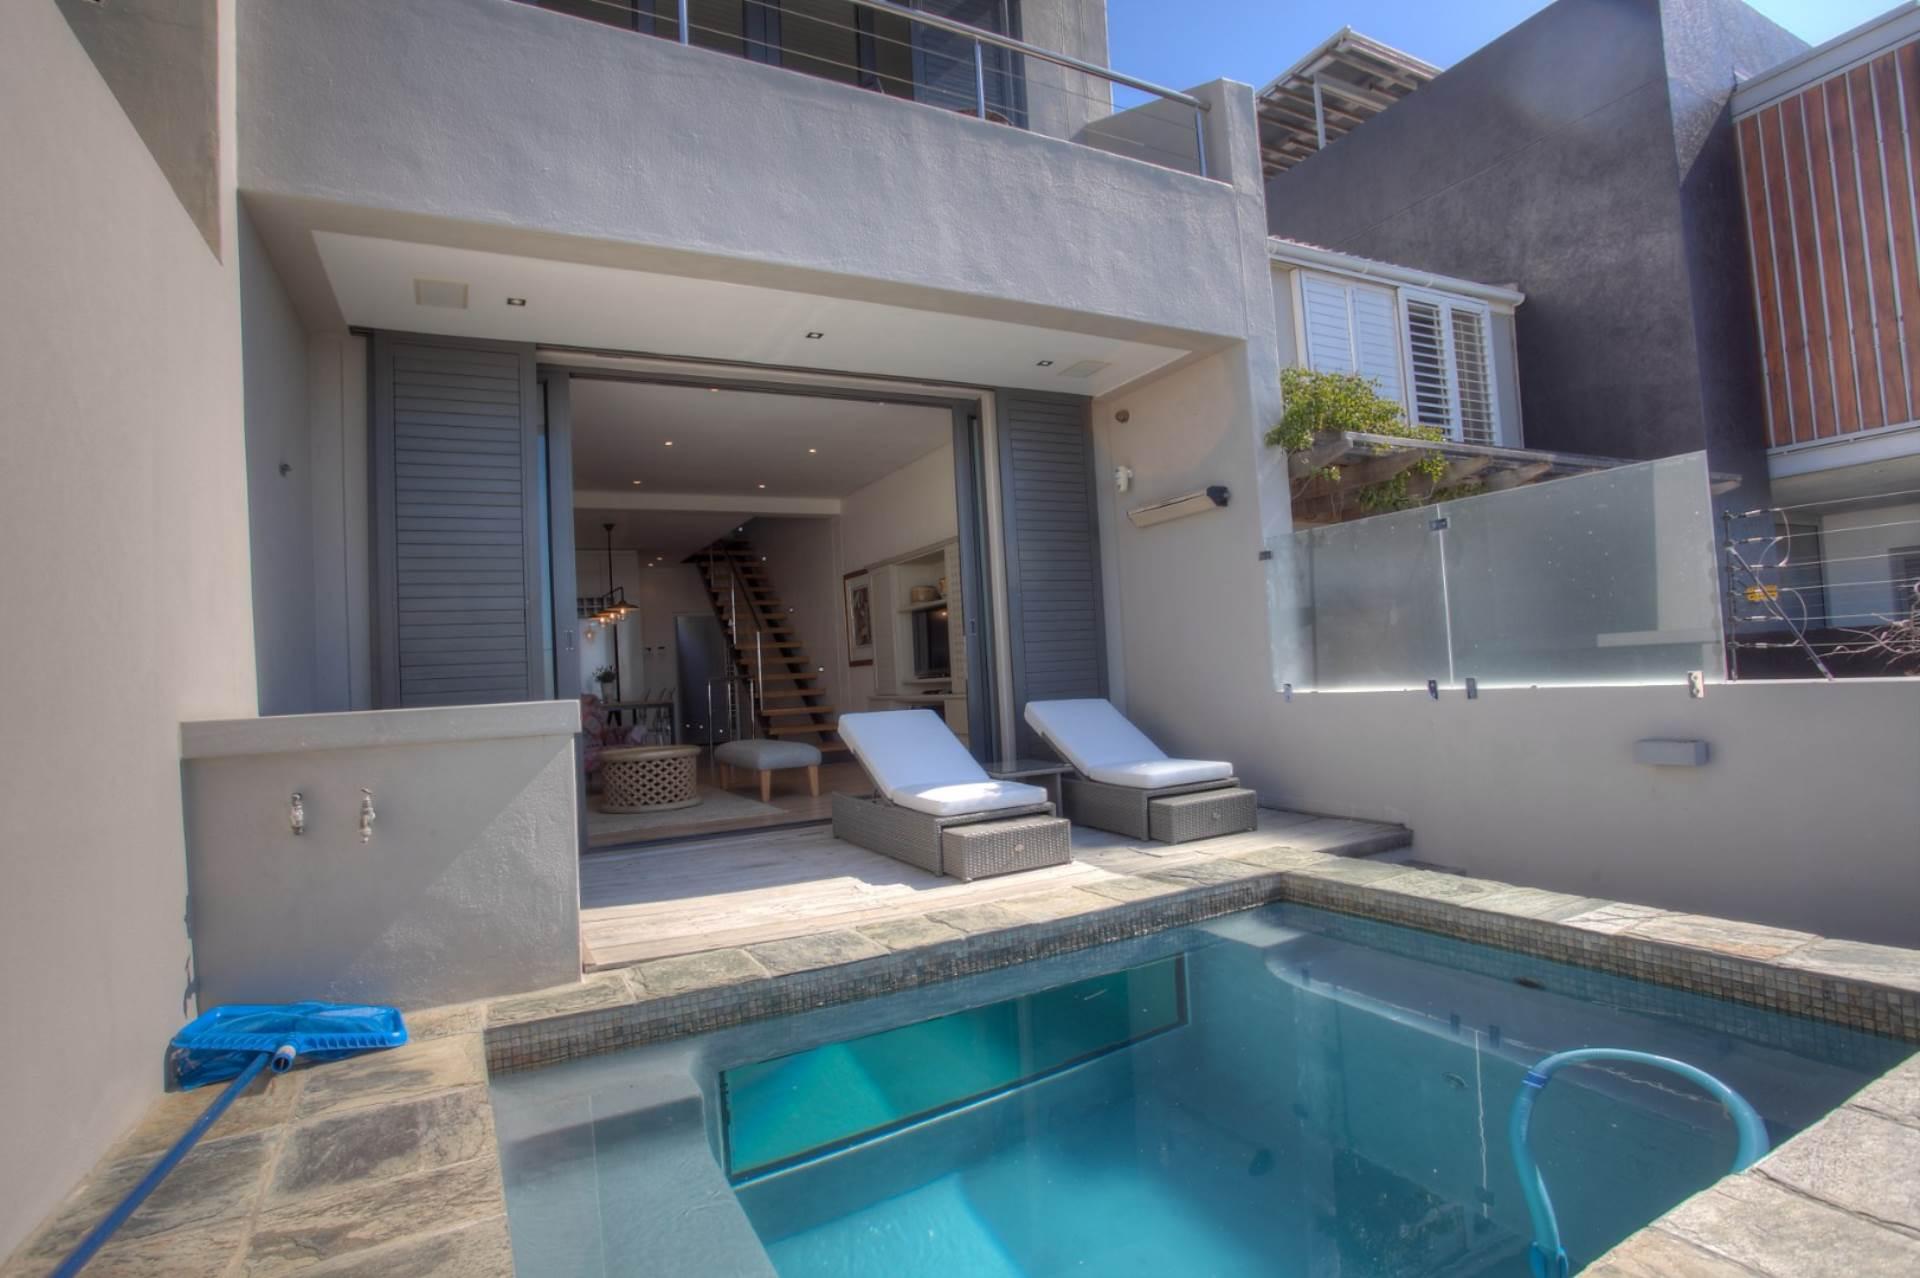 De Waterkant property for sale. Ref No: 13533994. Picture no 36